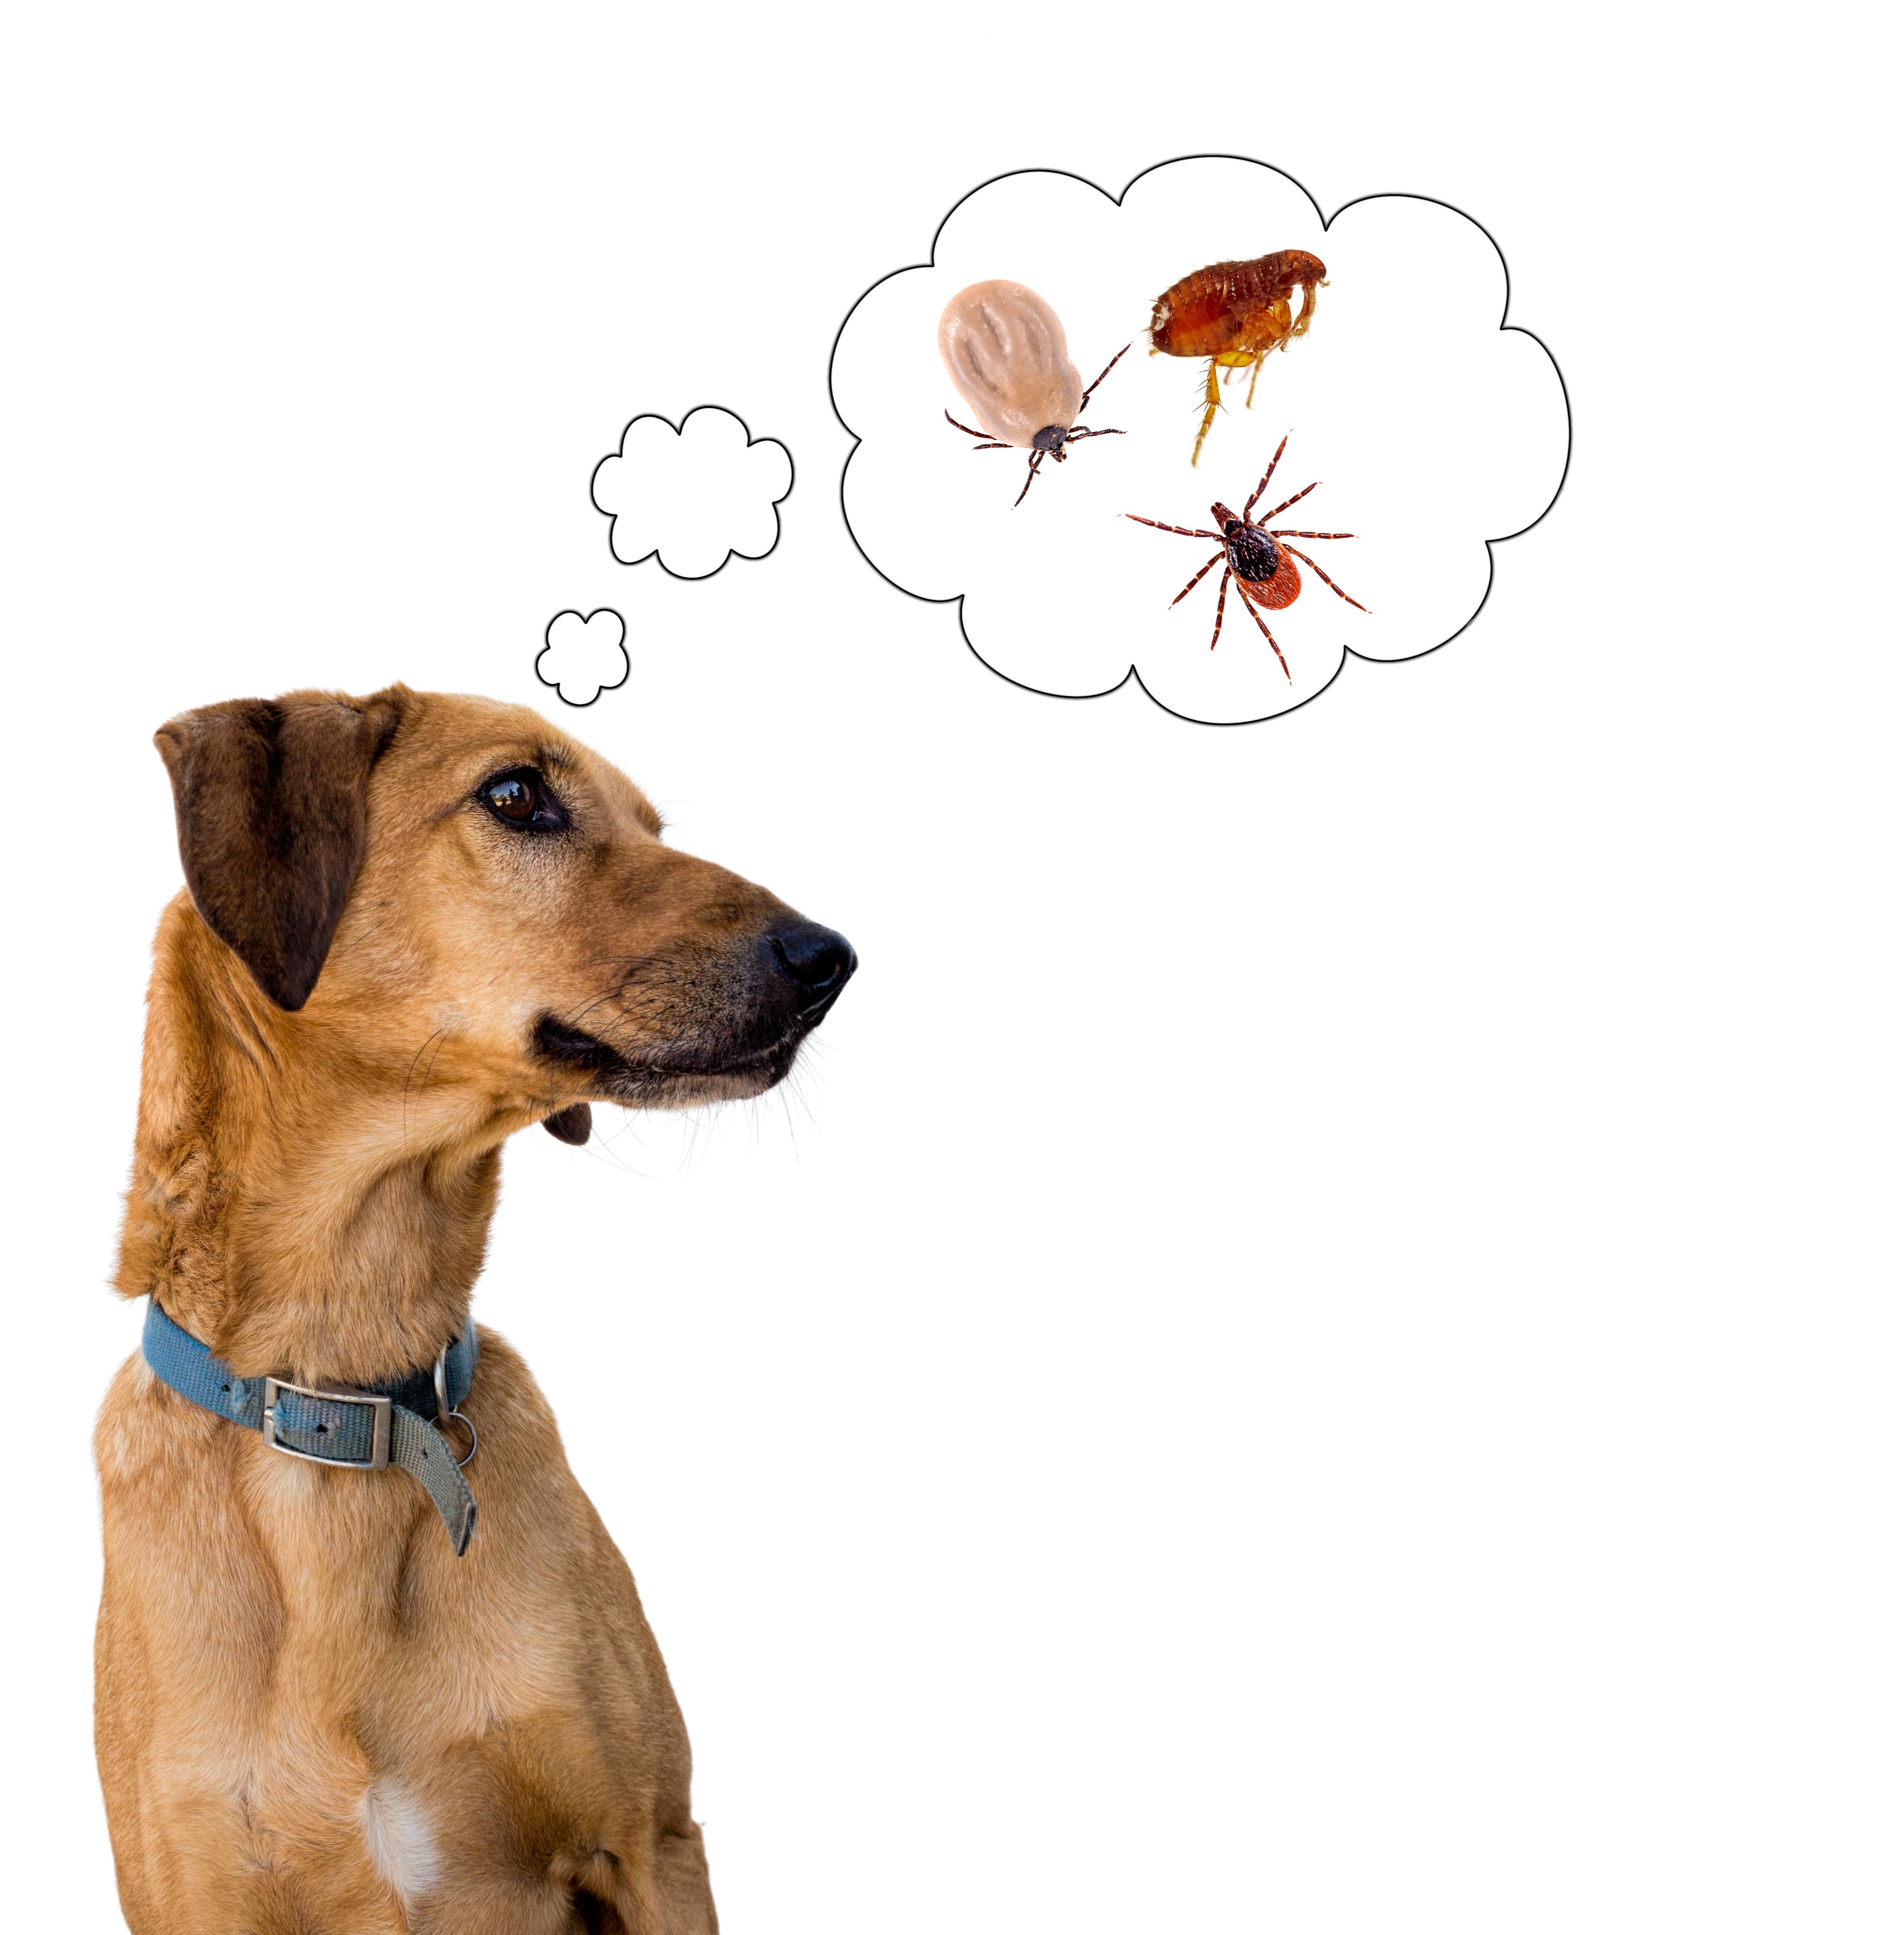 Preventing Fleas/Ticks in Pets